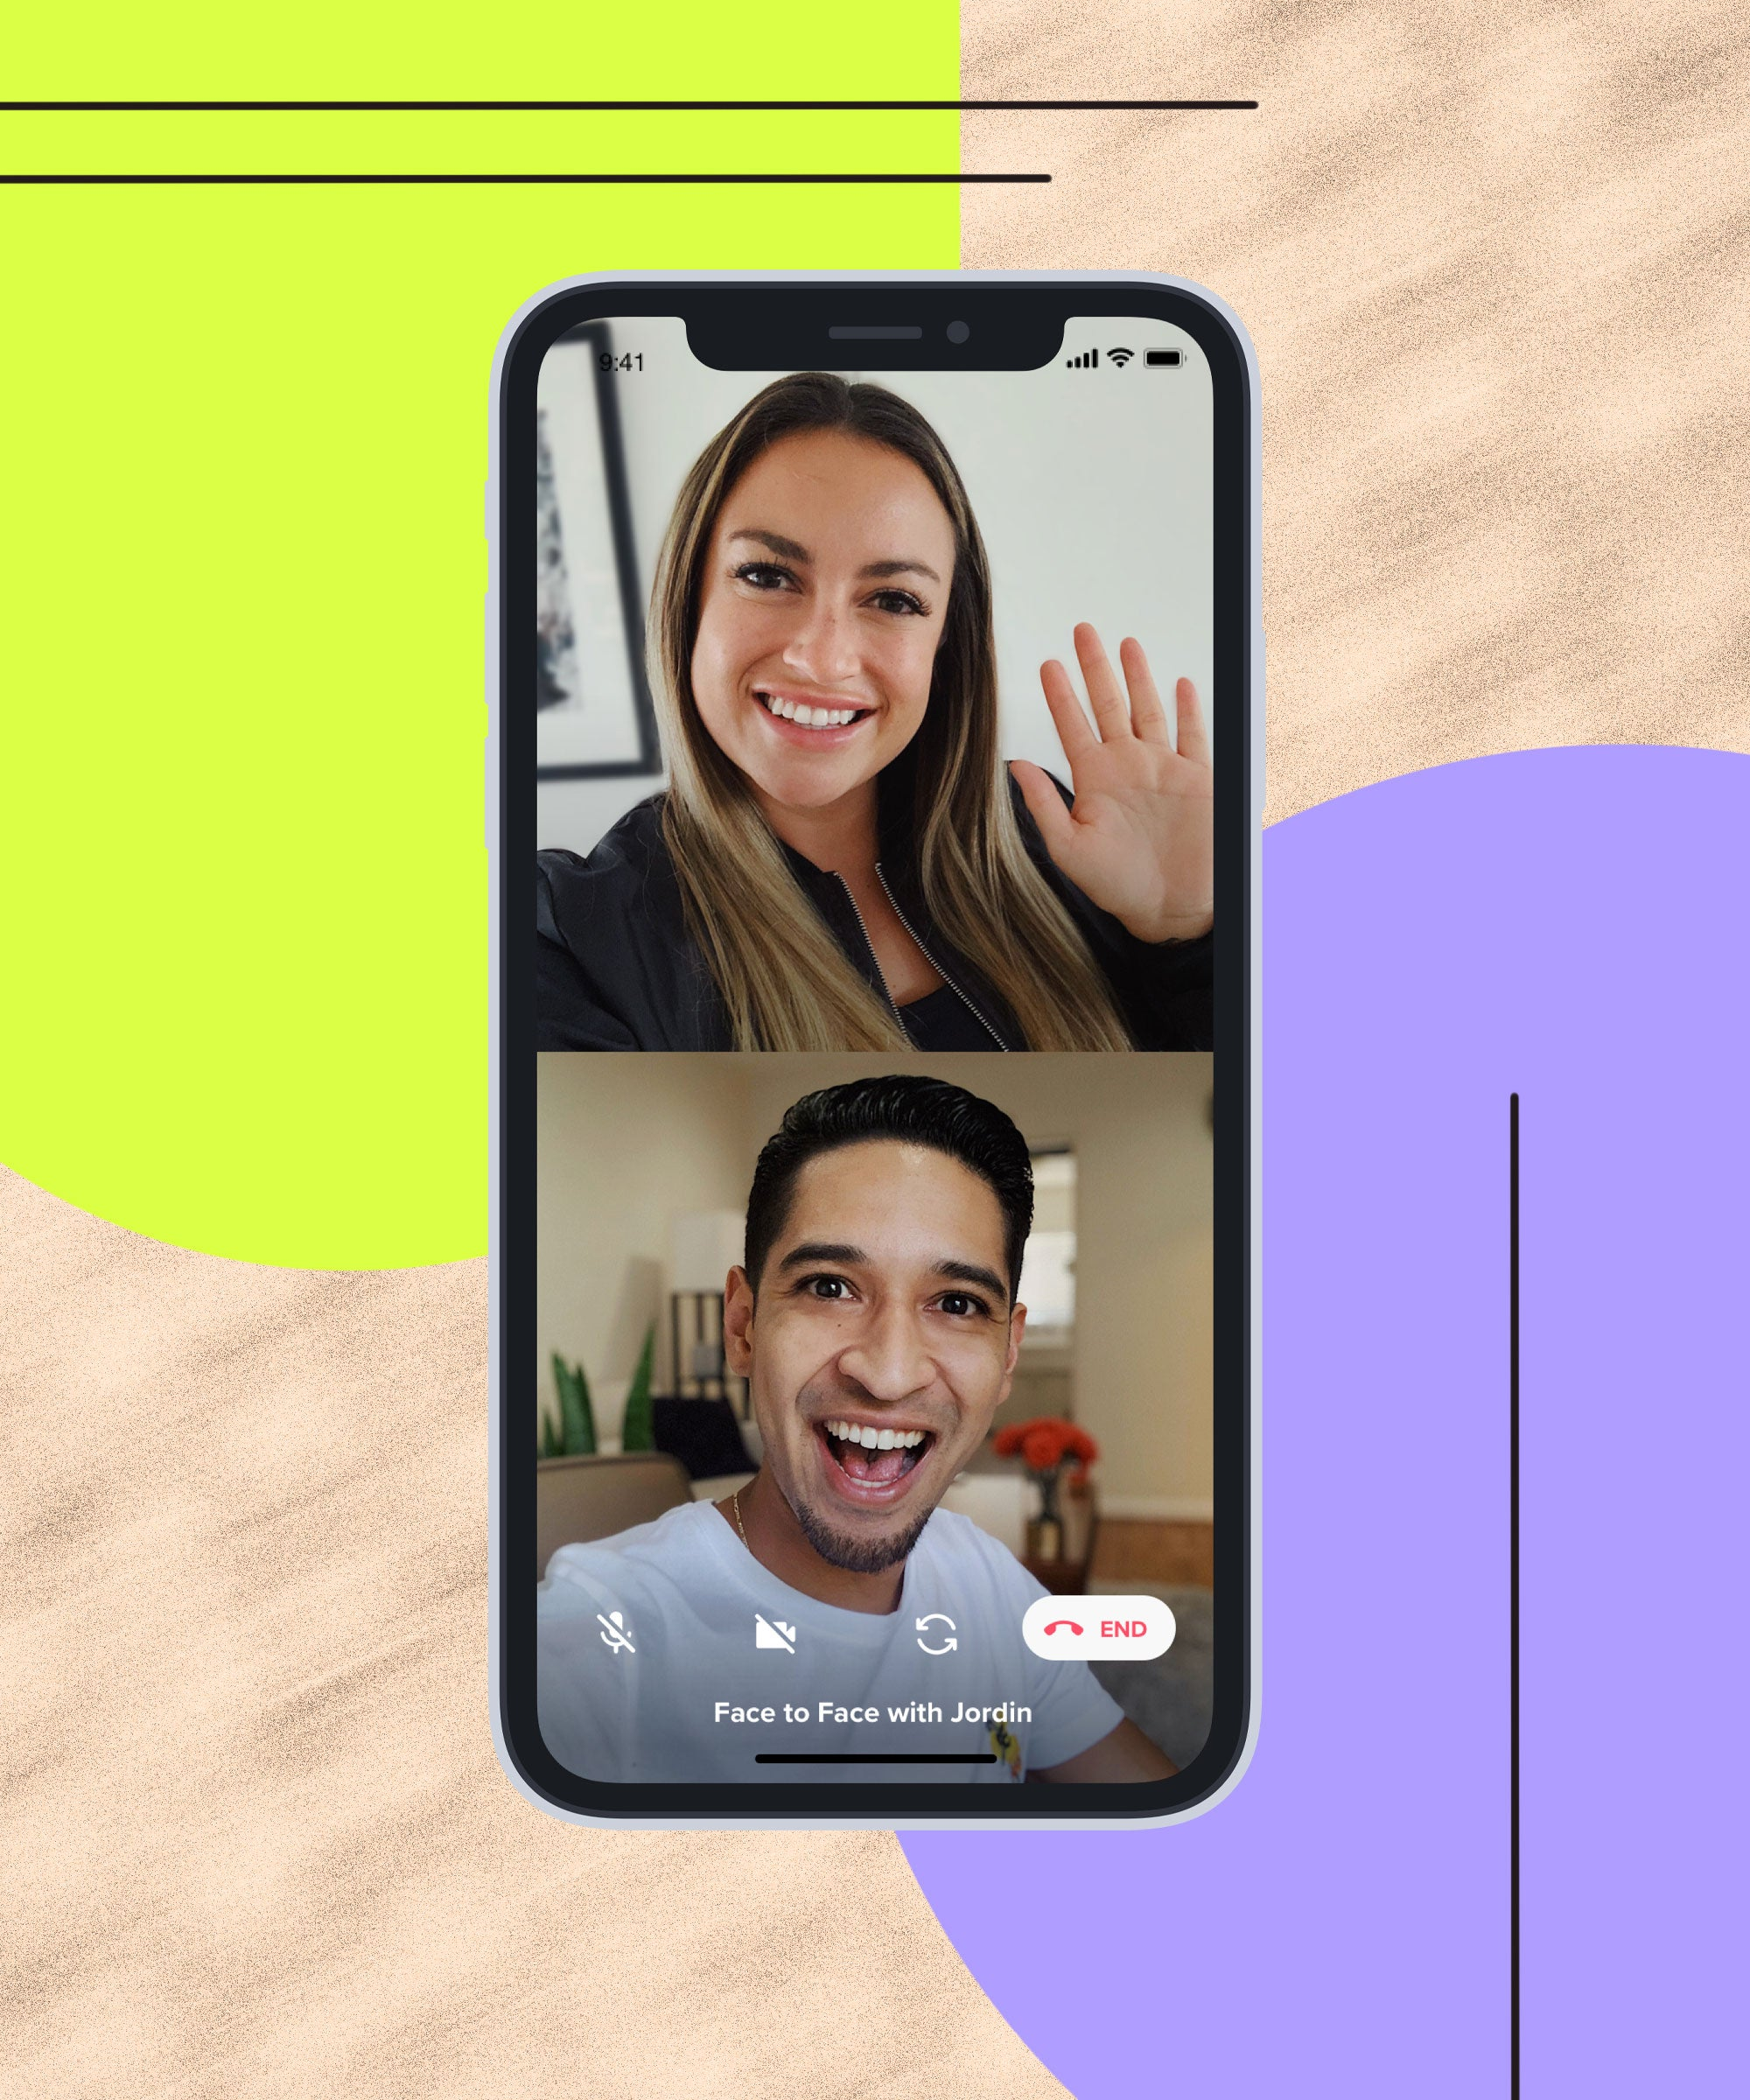 vi dating apps)